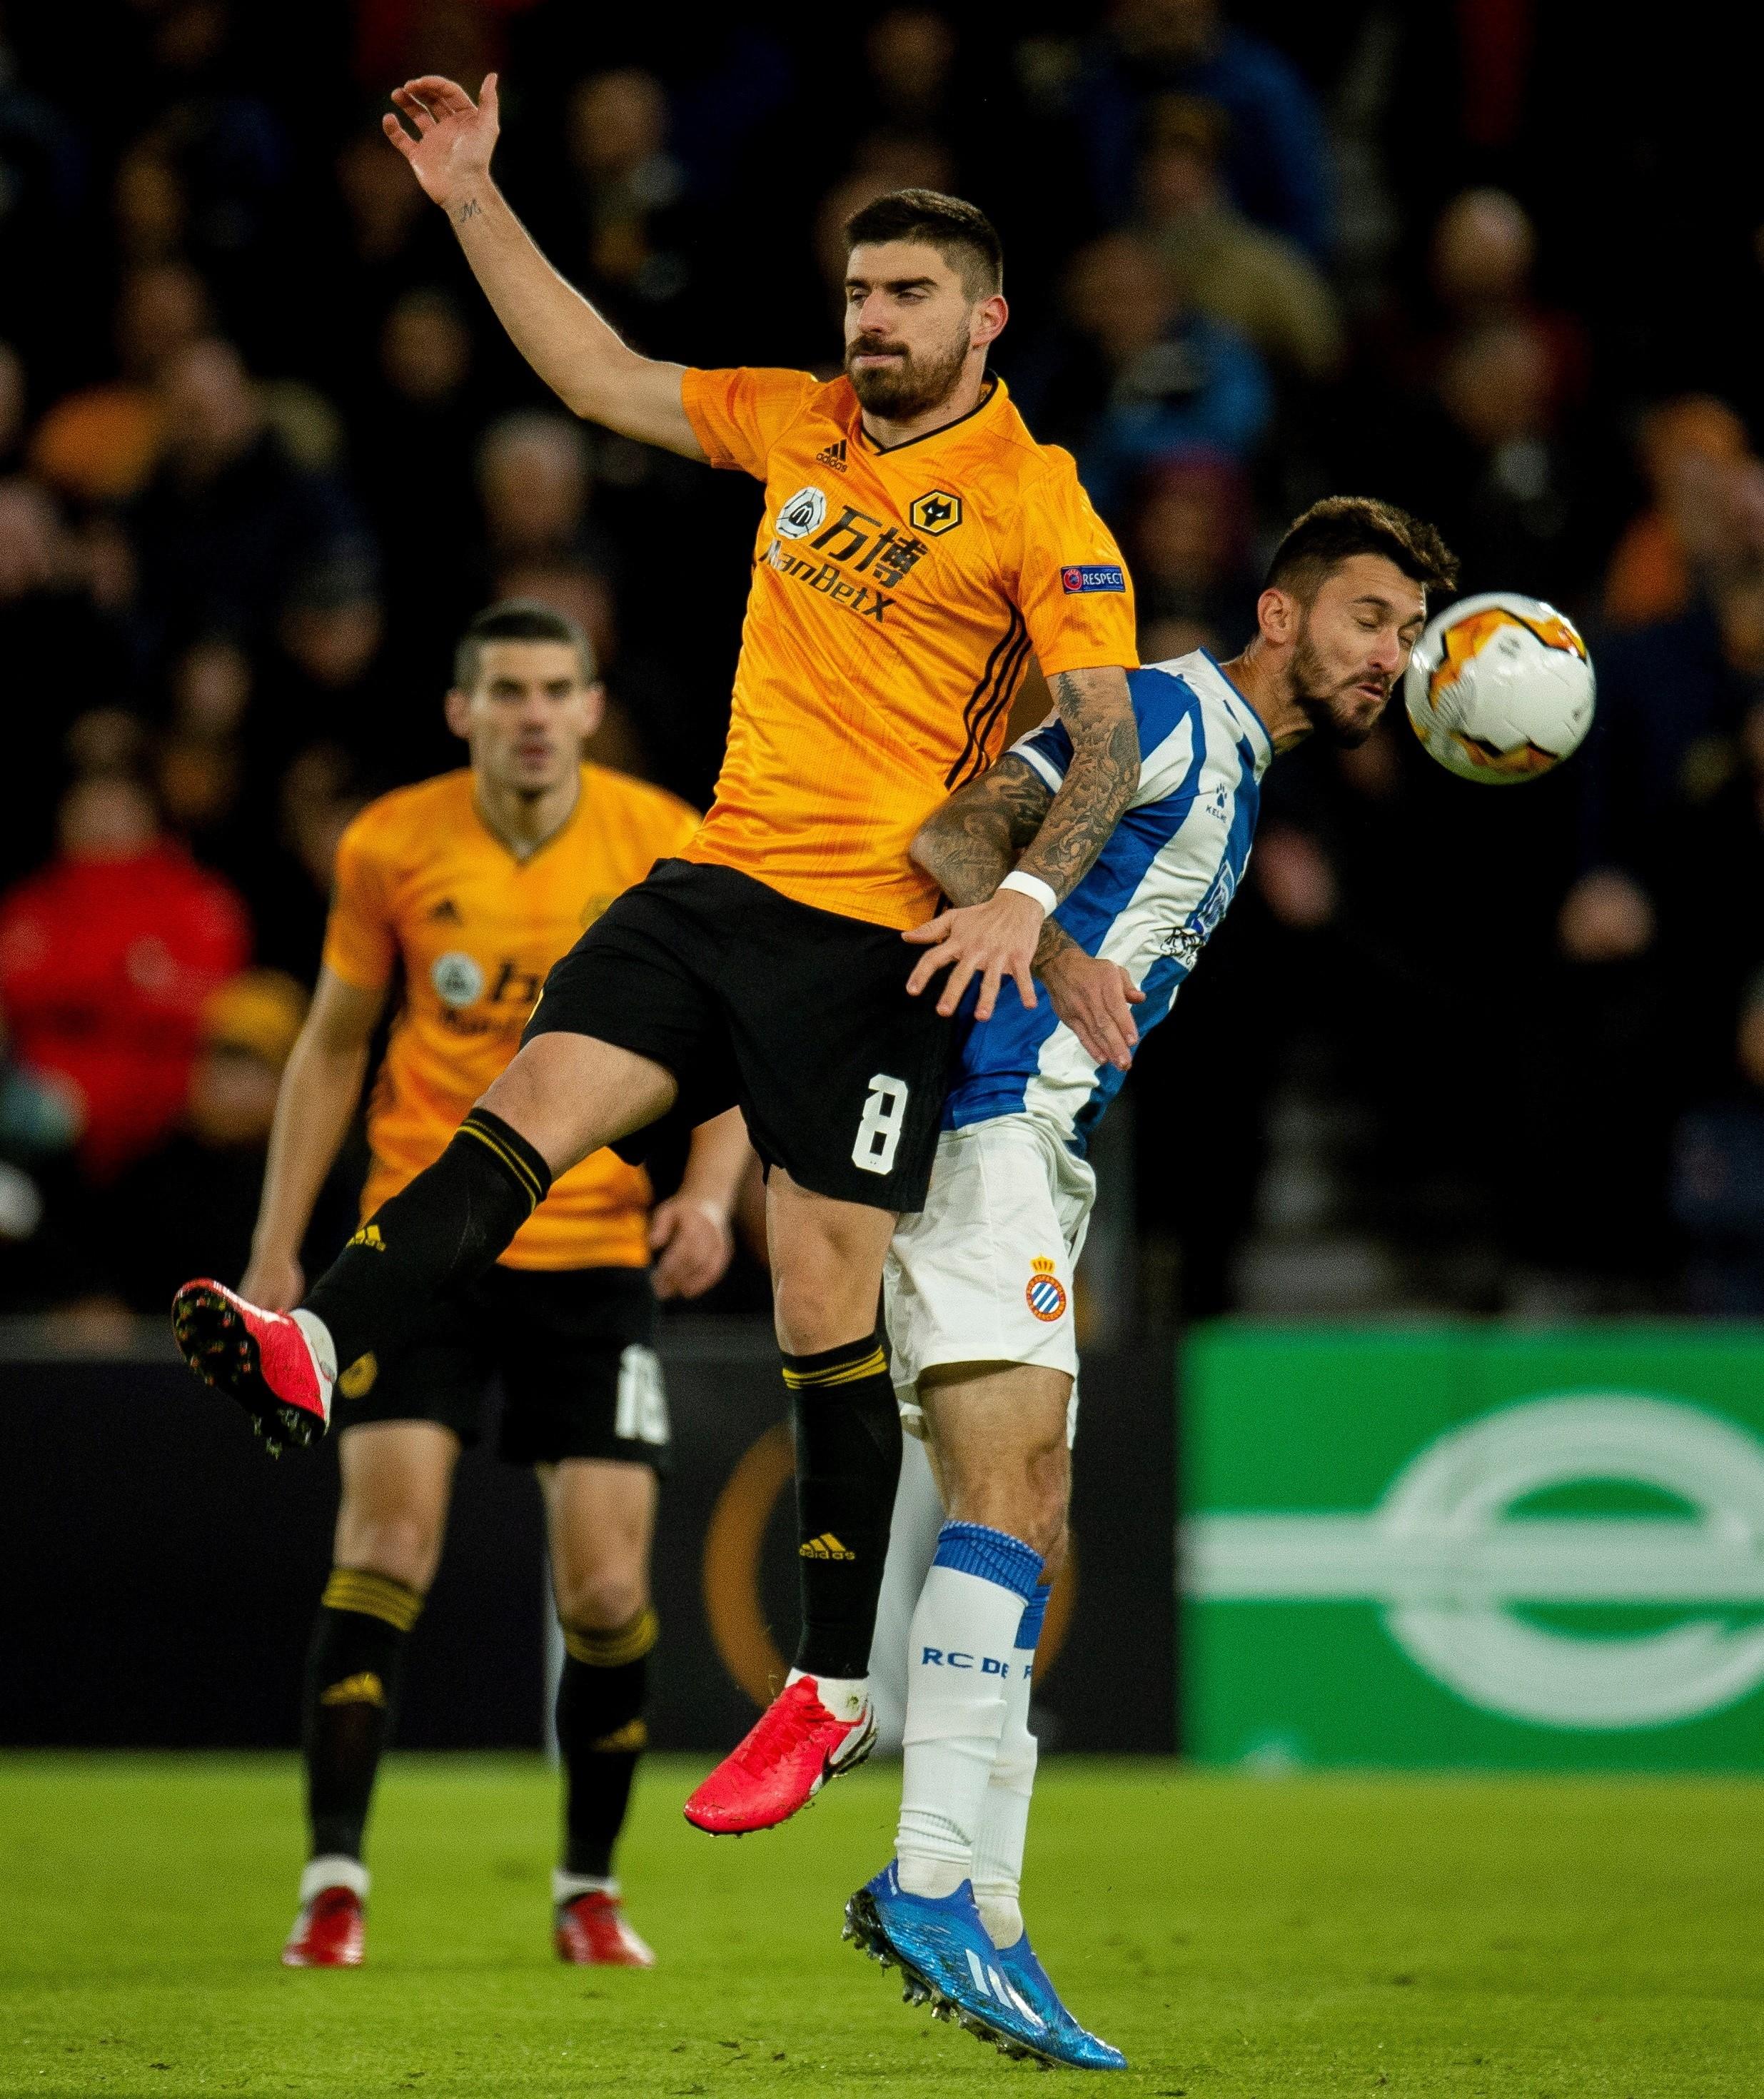 Wolves-Espanyol - Europa League 2019/20